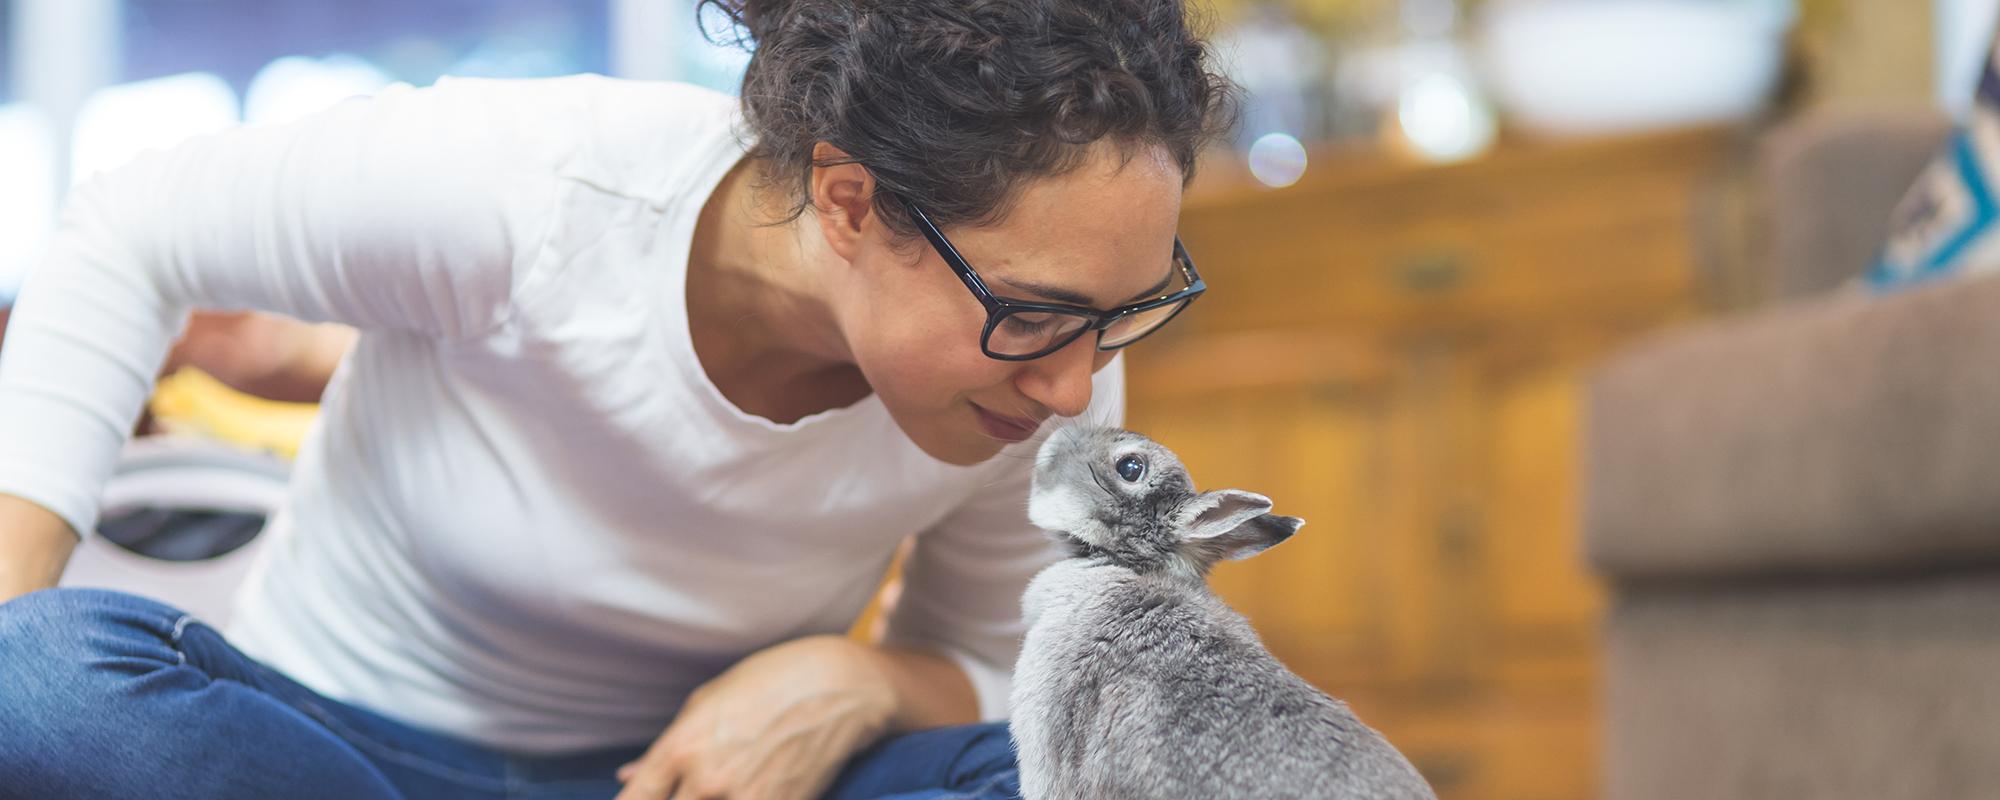 A woman admiring her pet bunny.